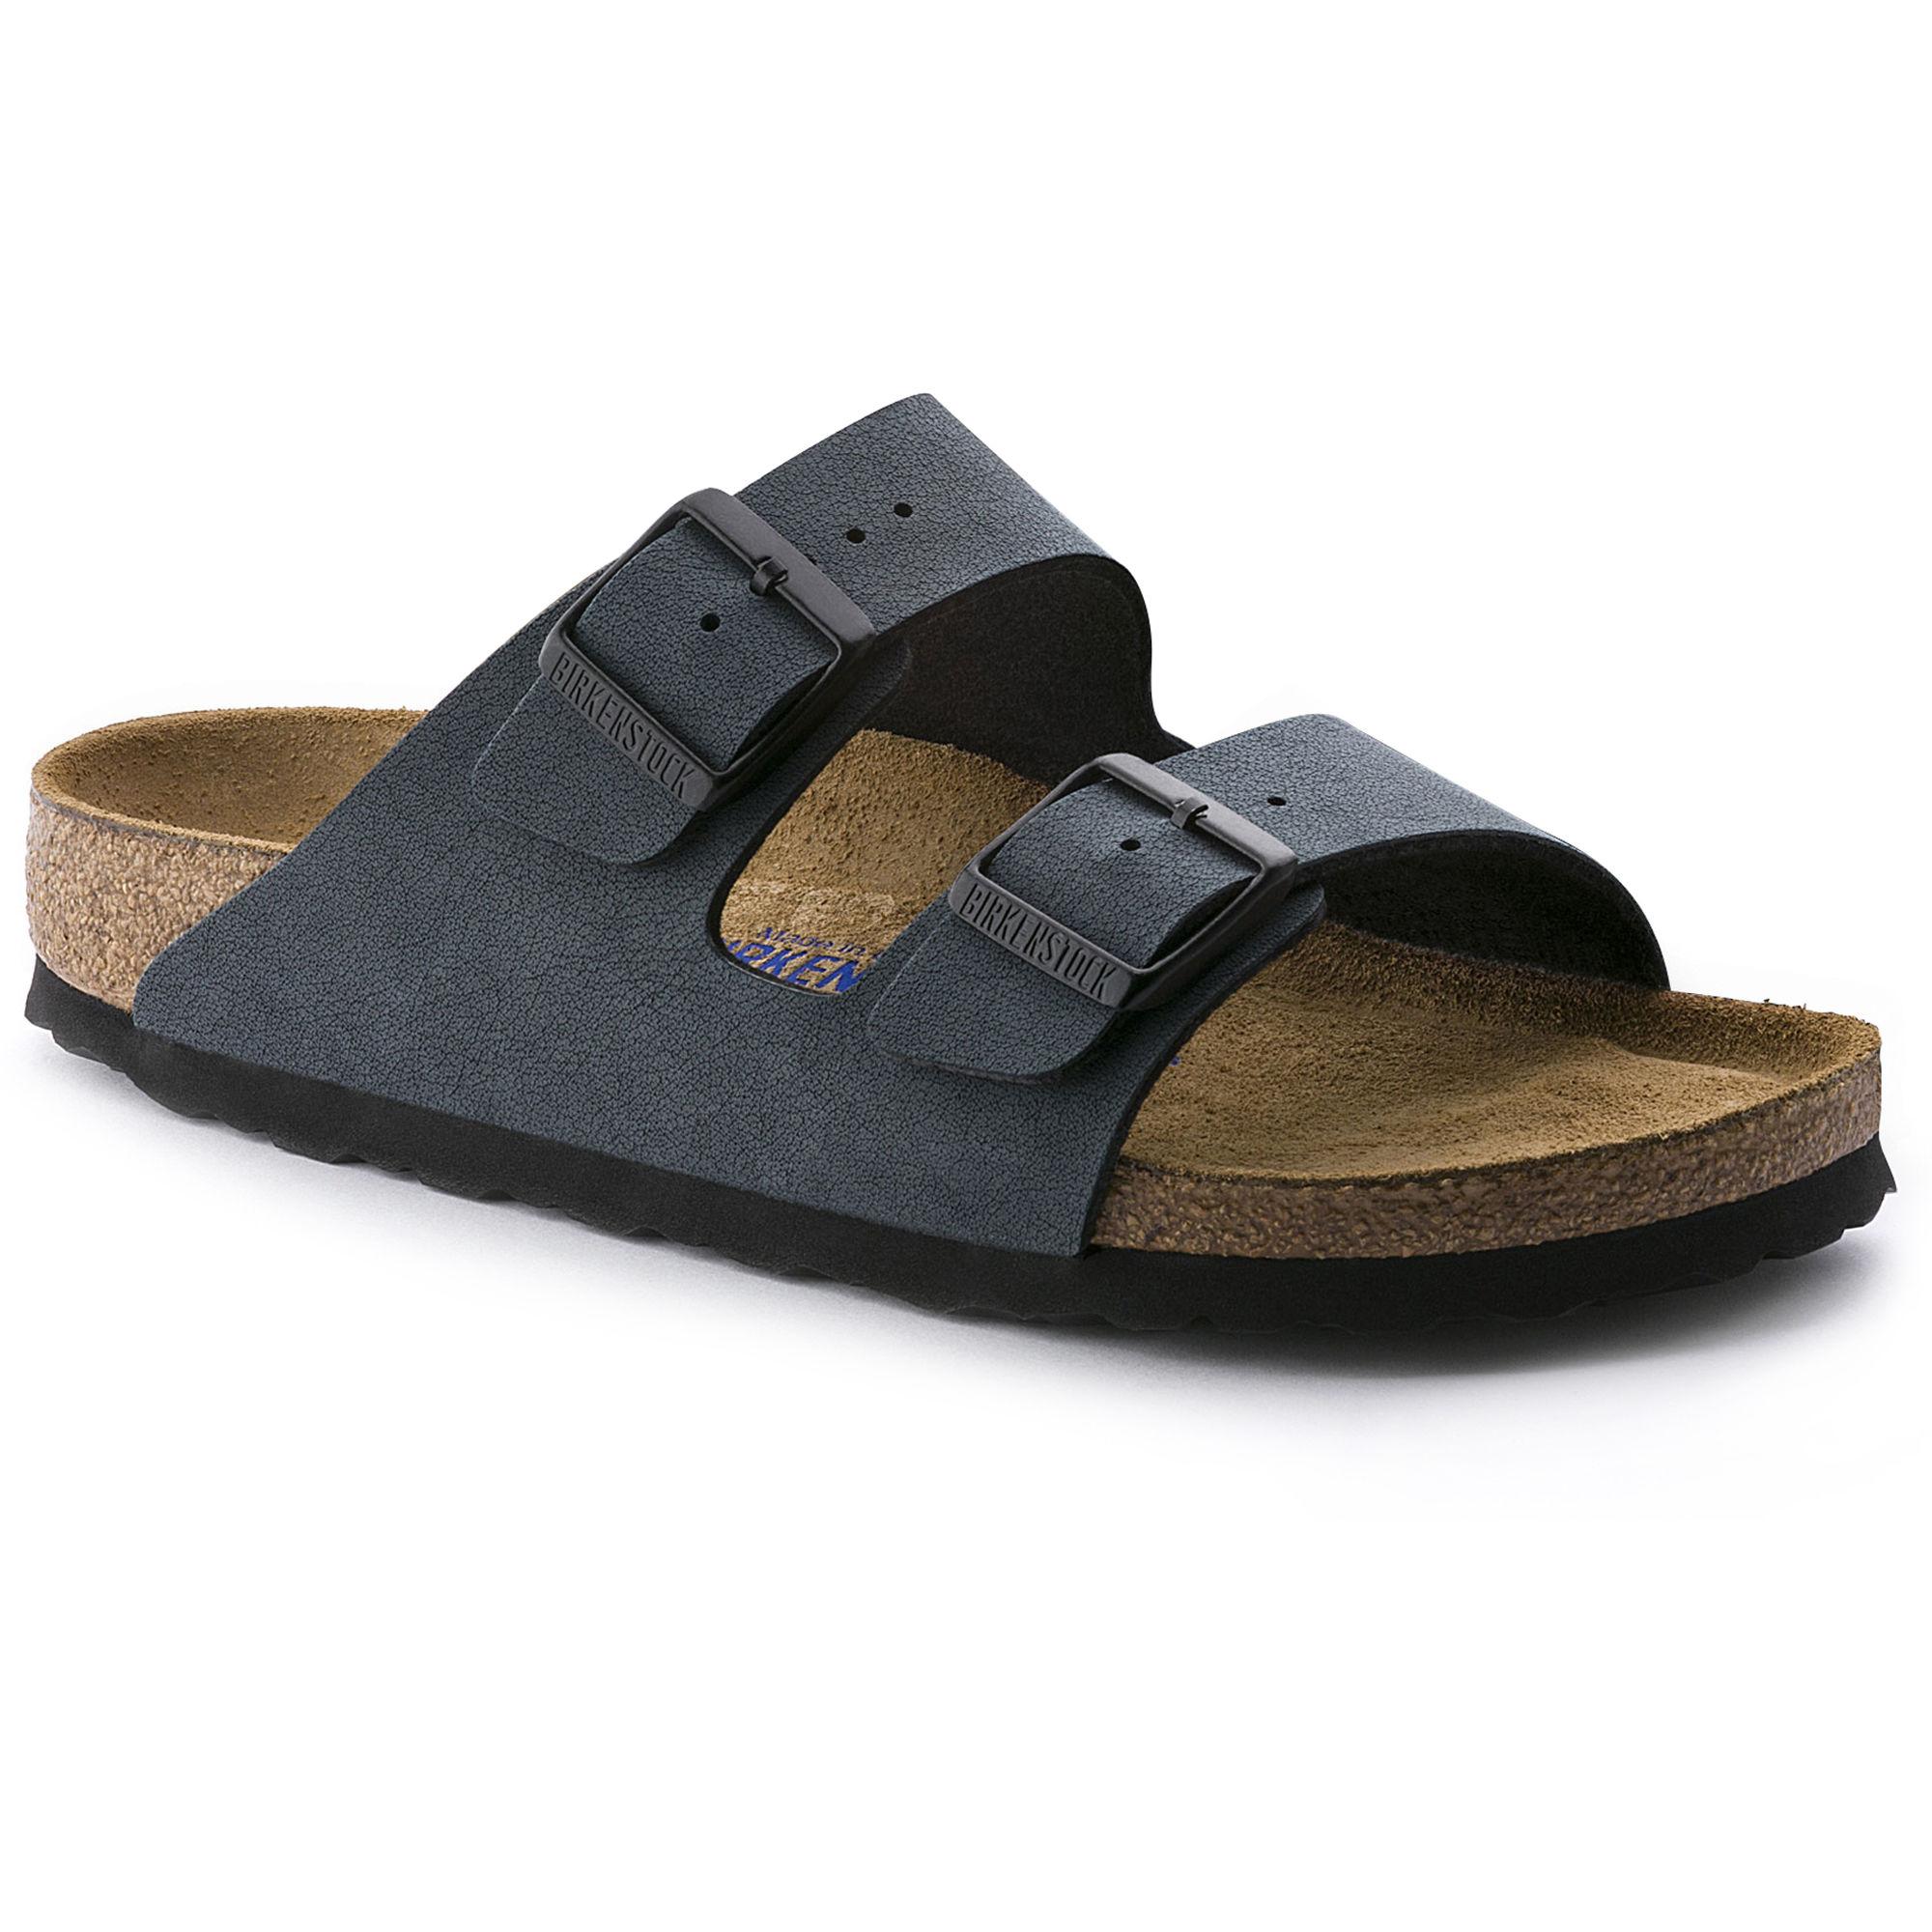 Birkenstock Arizona Nubuck Soft Footbed Sandals aNipssdIZ9